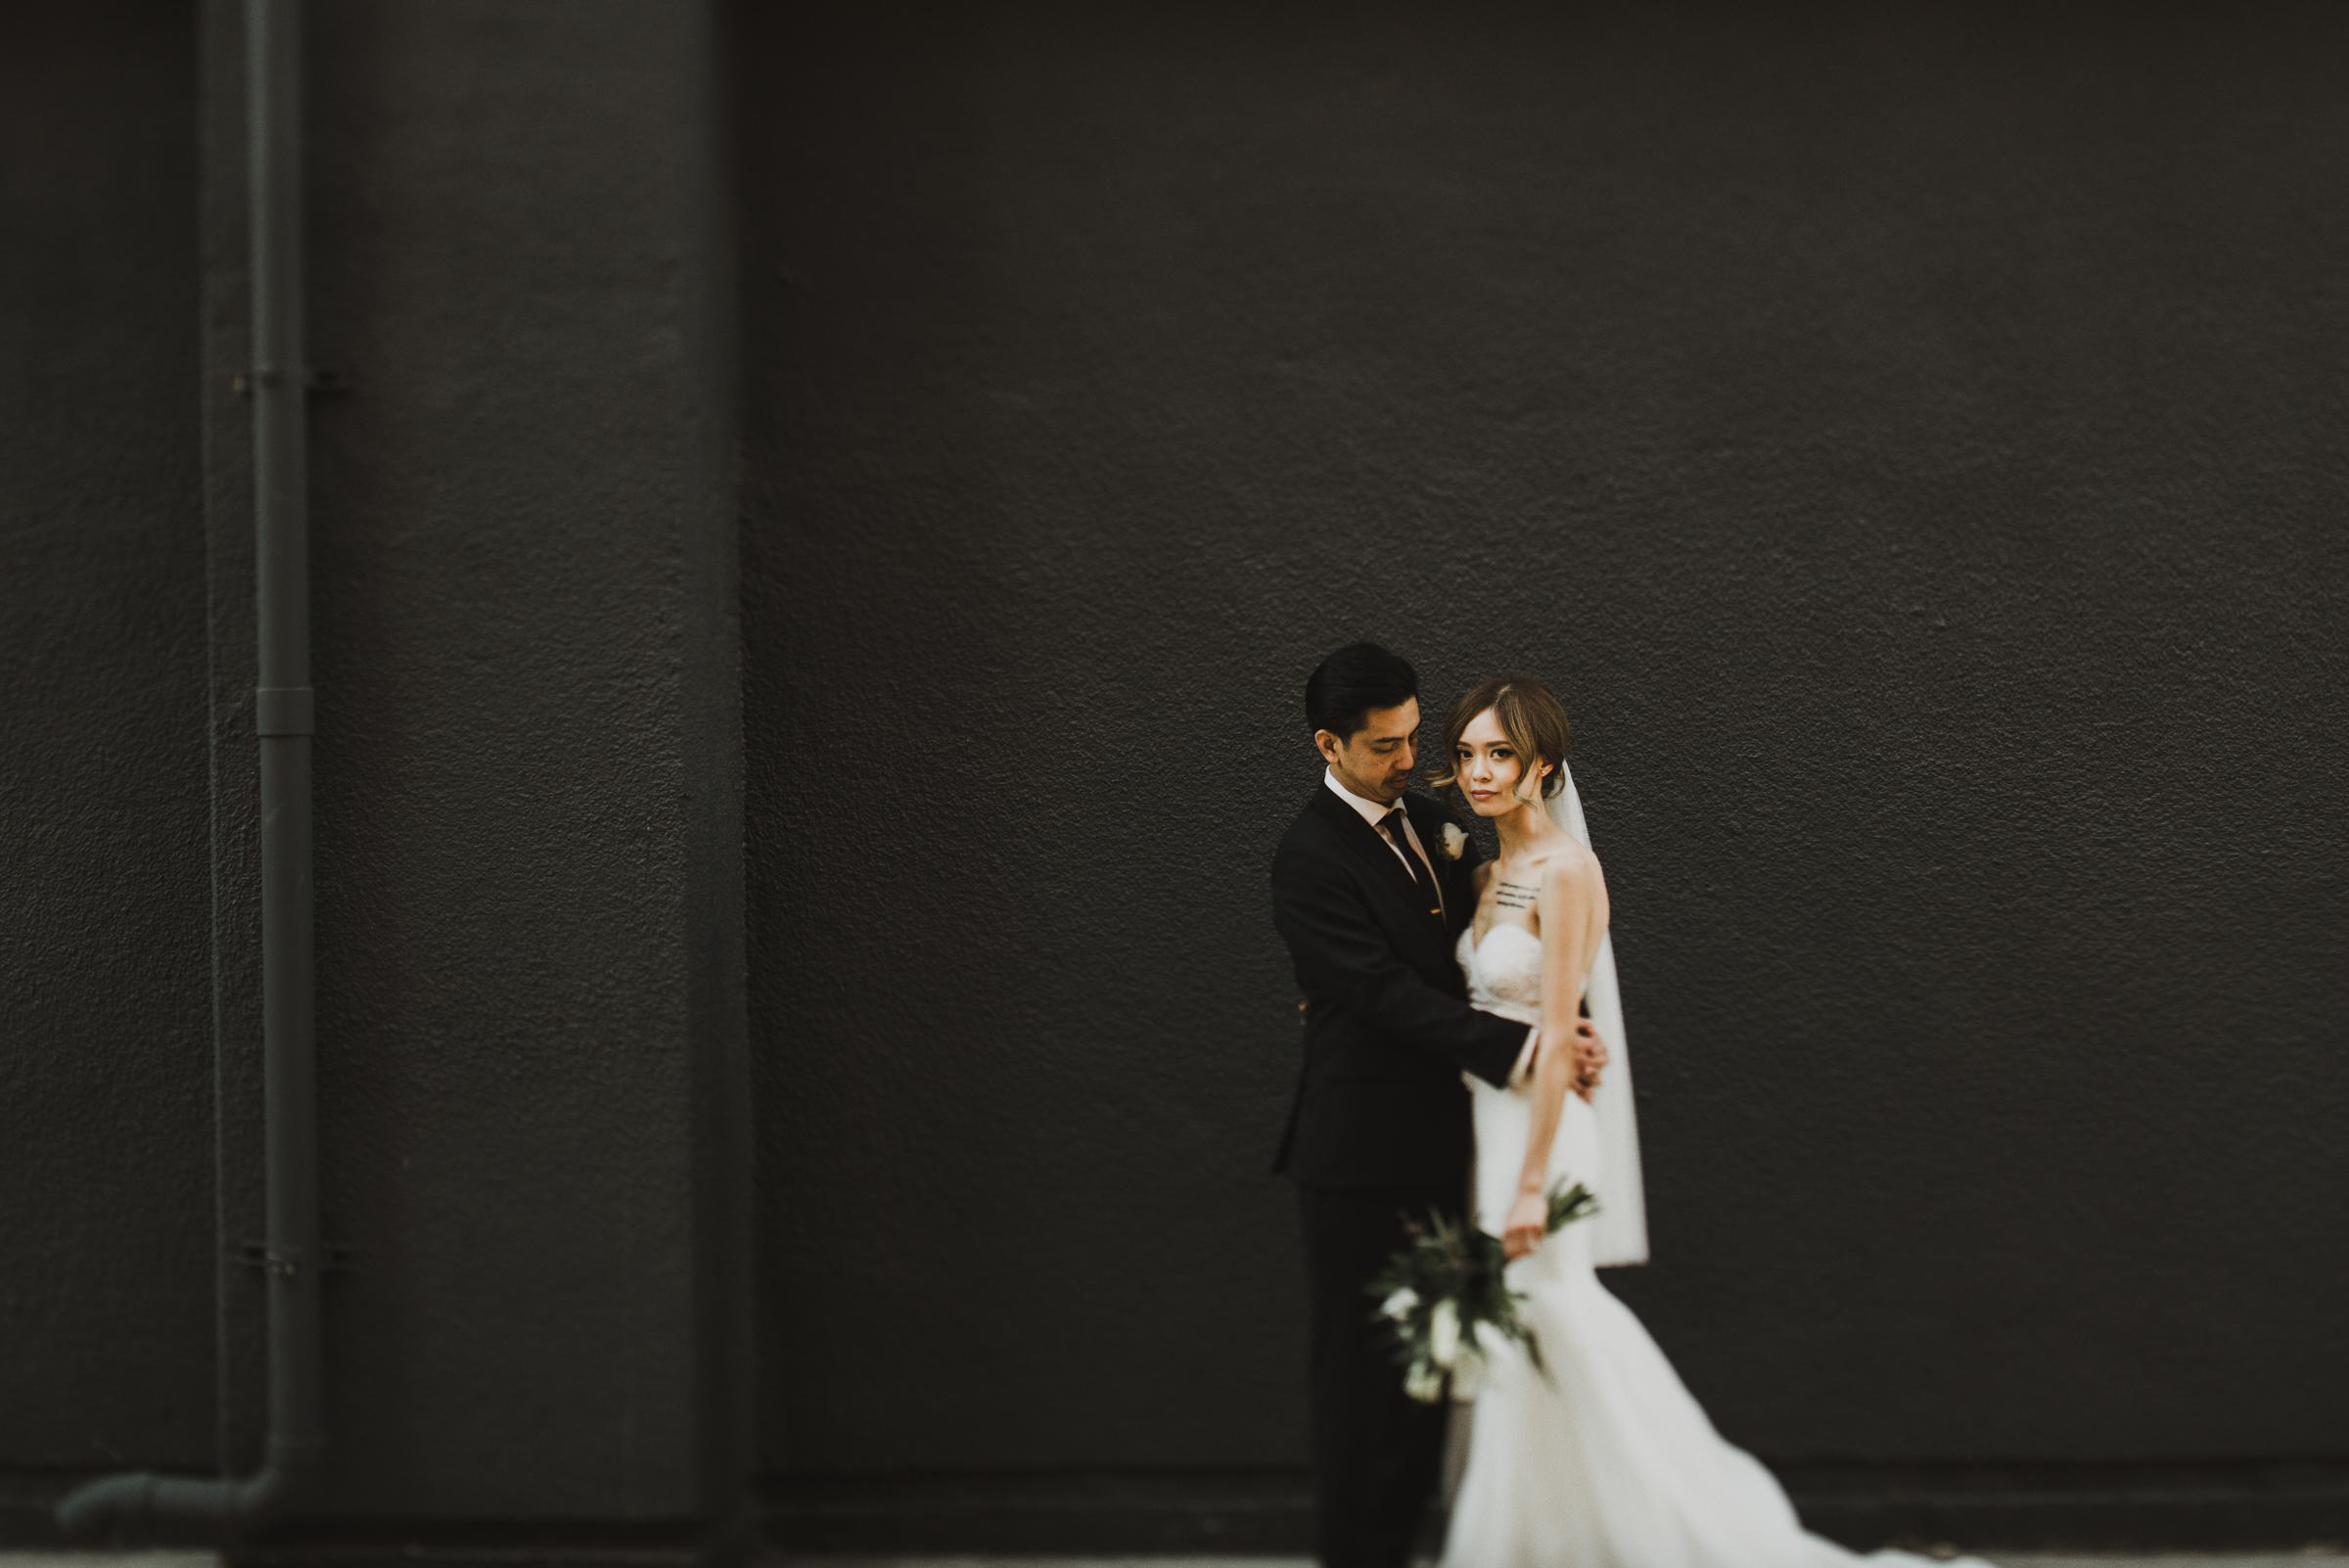 ©Isaiah + Taylor Photography - The Estate On Second Wedding, Santa Ana - Orange County Wedding Photographer-85.jpg